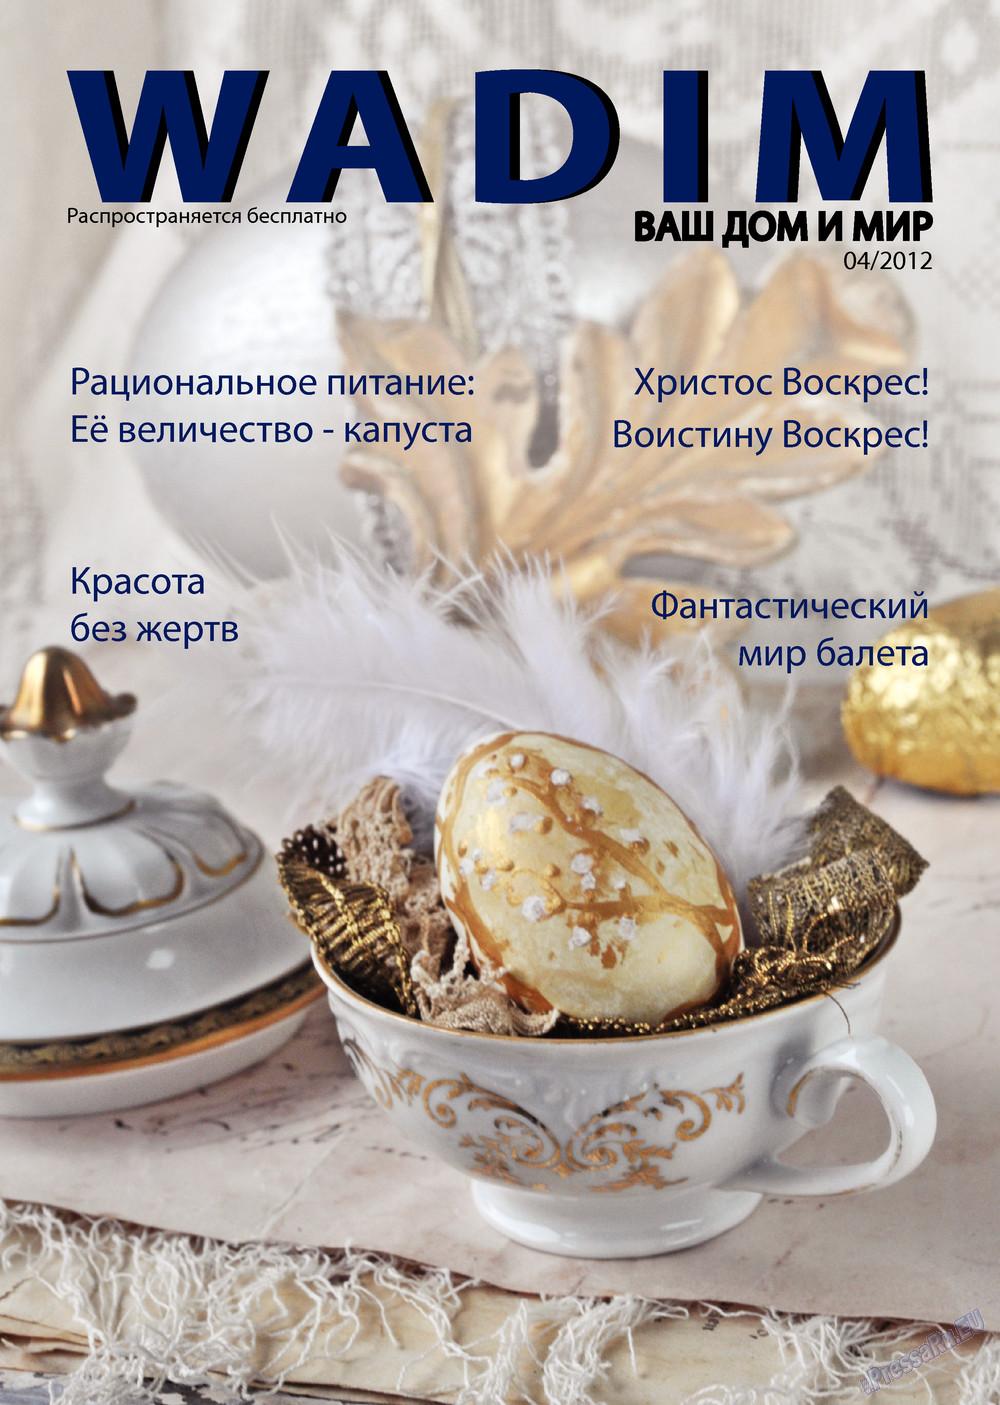 Wadim (журнал). 2012 год, номер 4, стр. 1